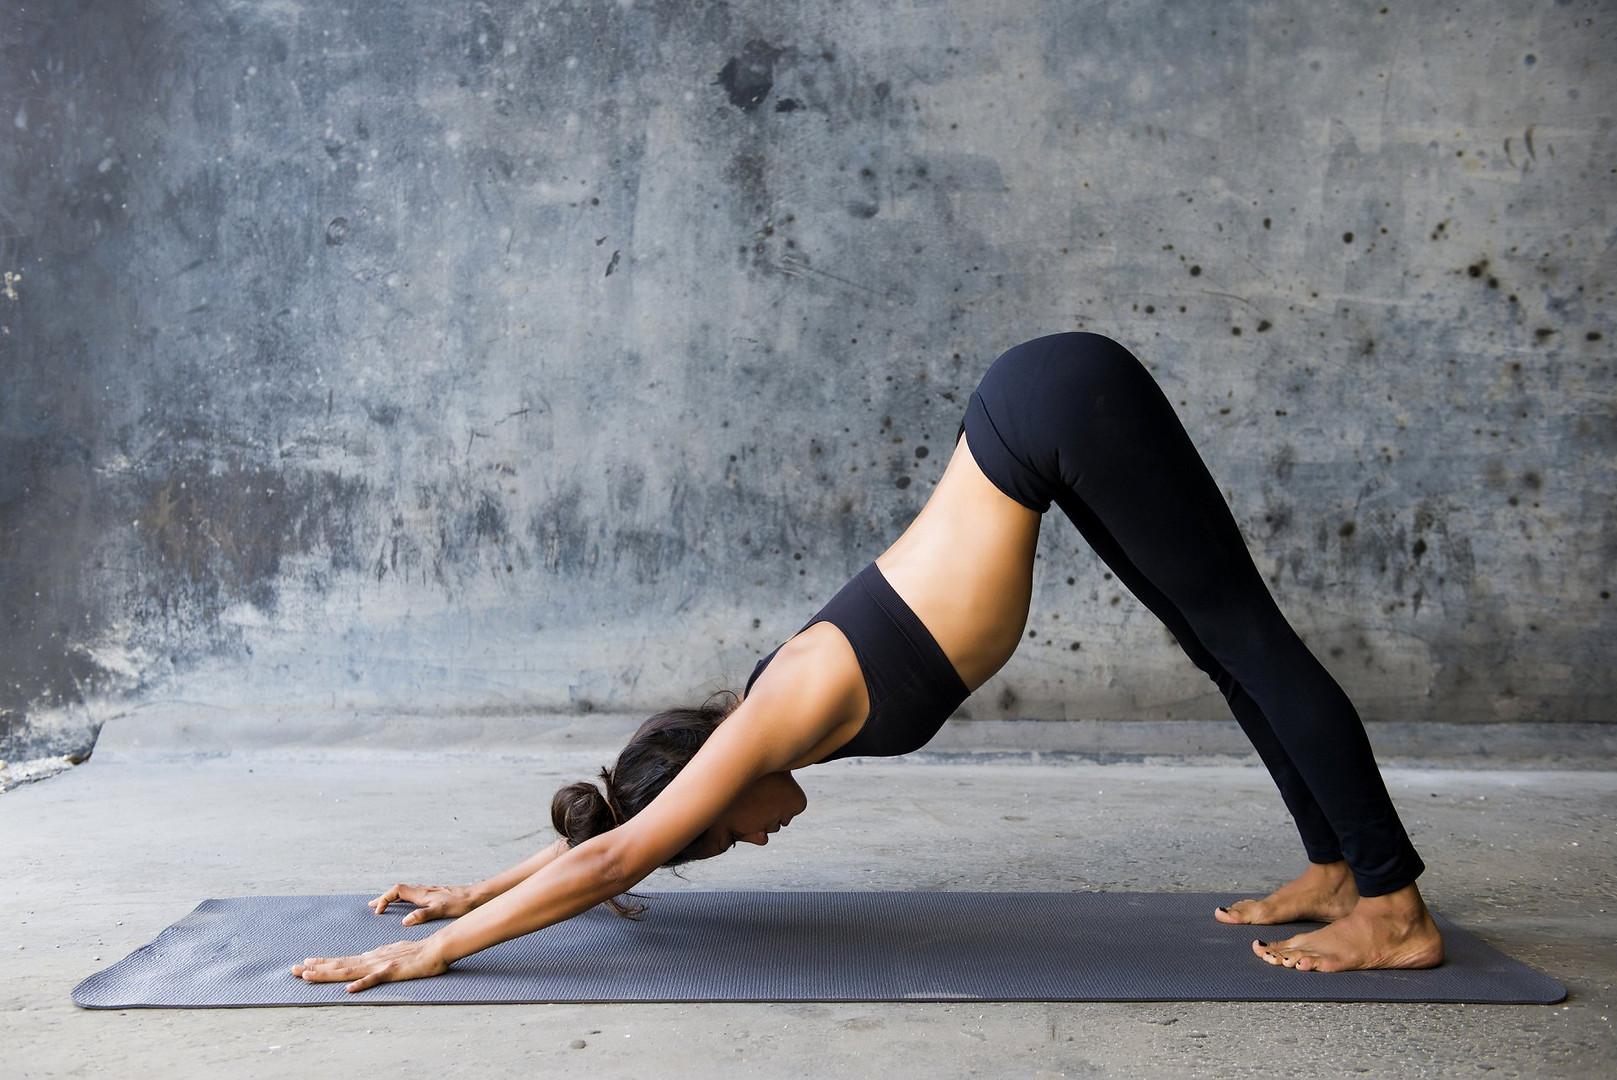 female-yoga-wallpaper-61326-63143-hd-wal